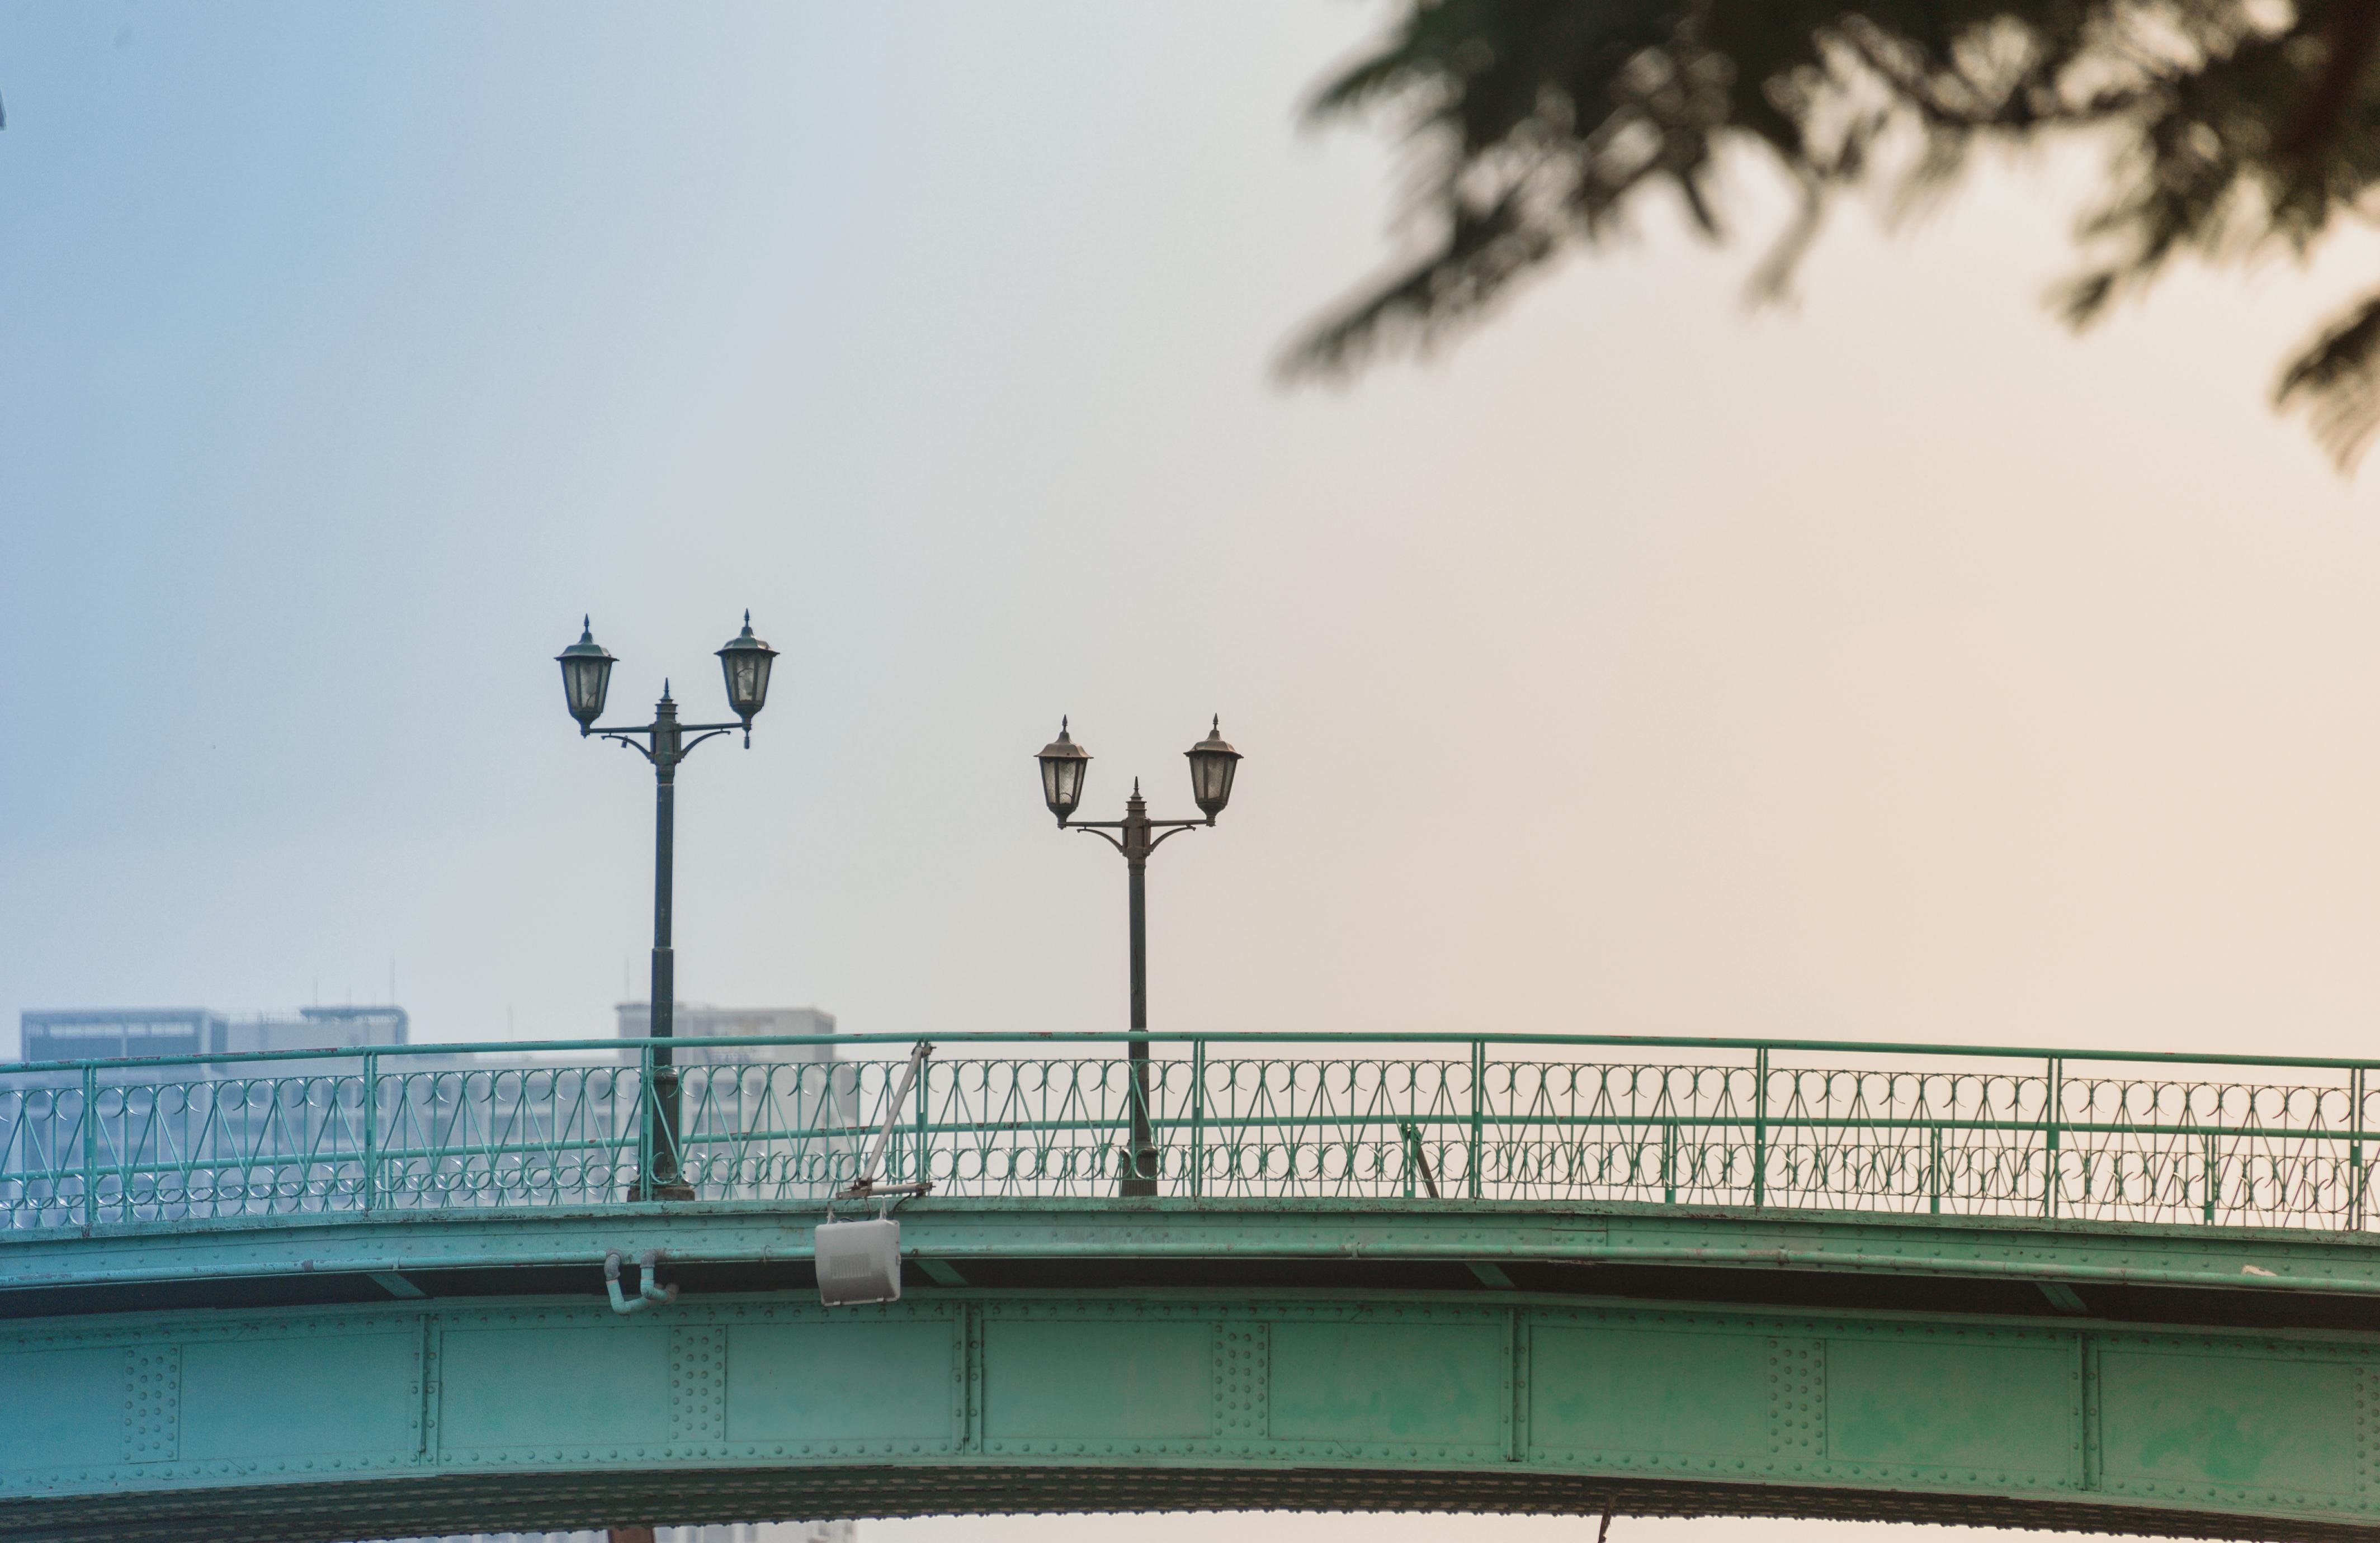 Two Road Lights on Bridge